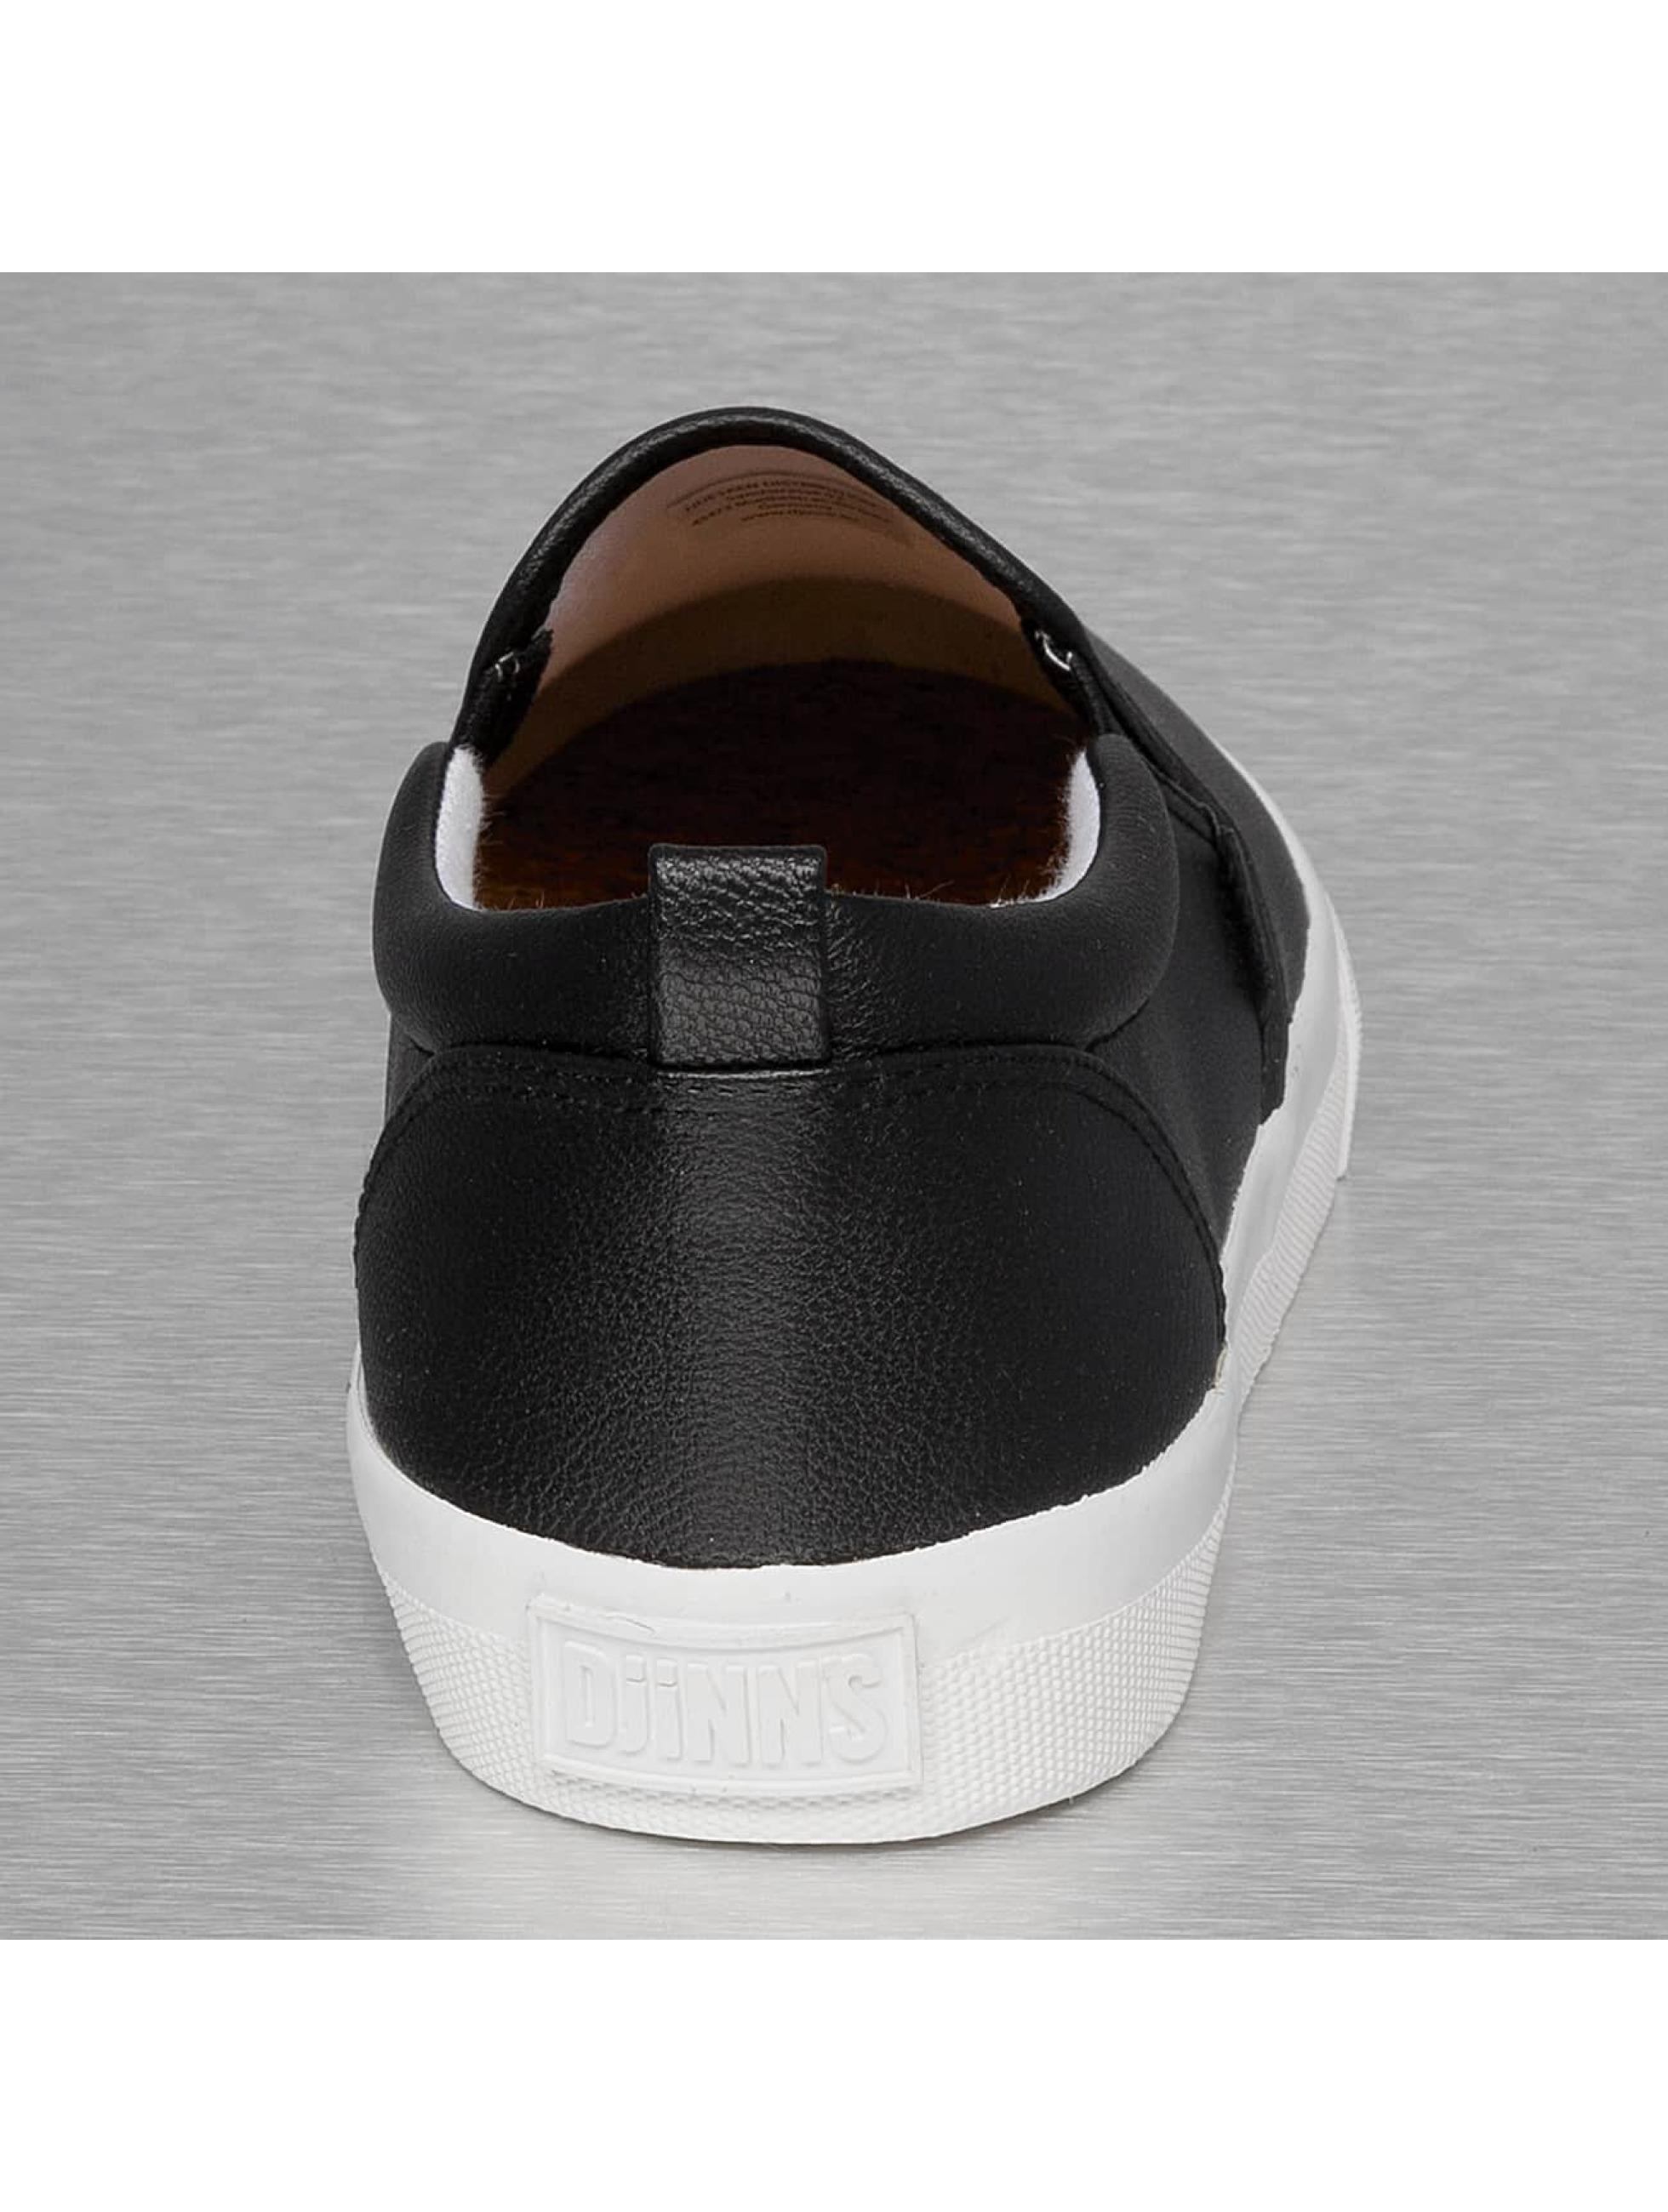 Djinns Baskets Leather Slider noir